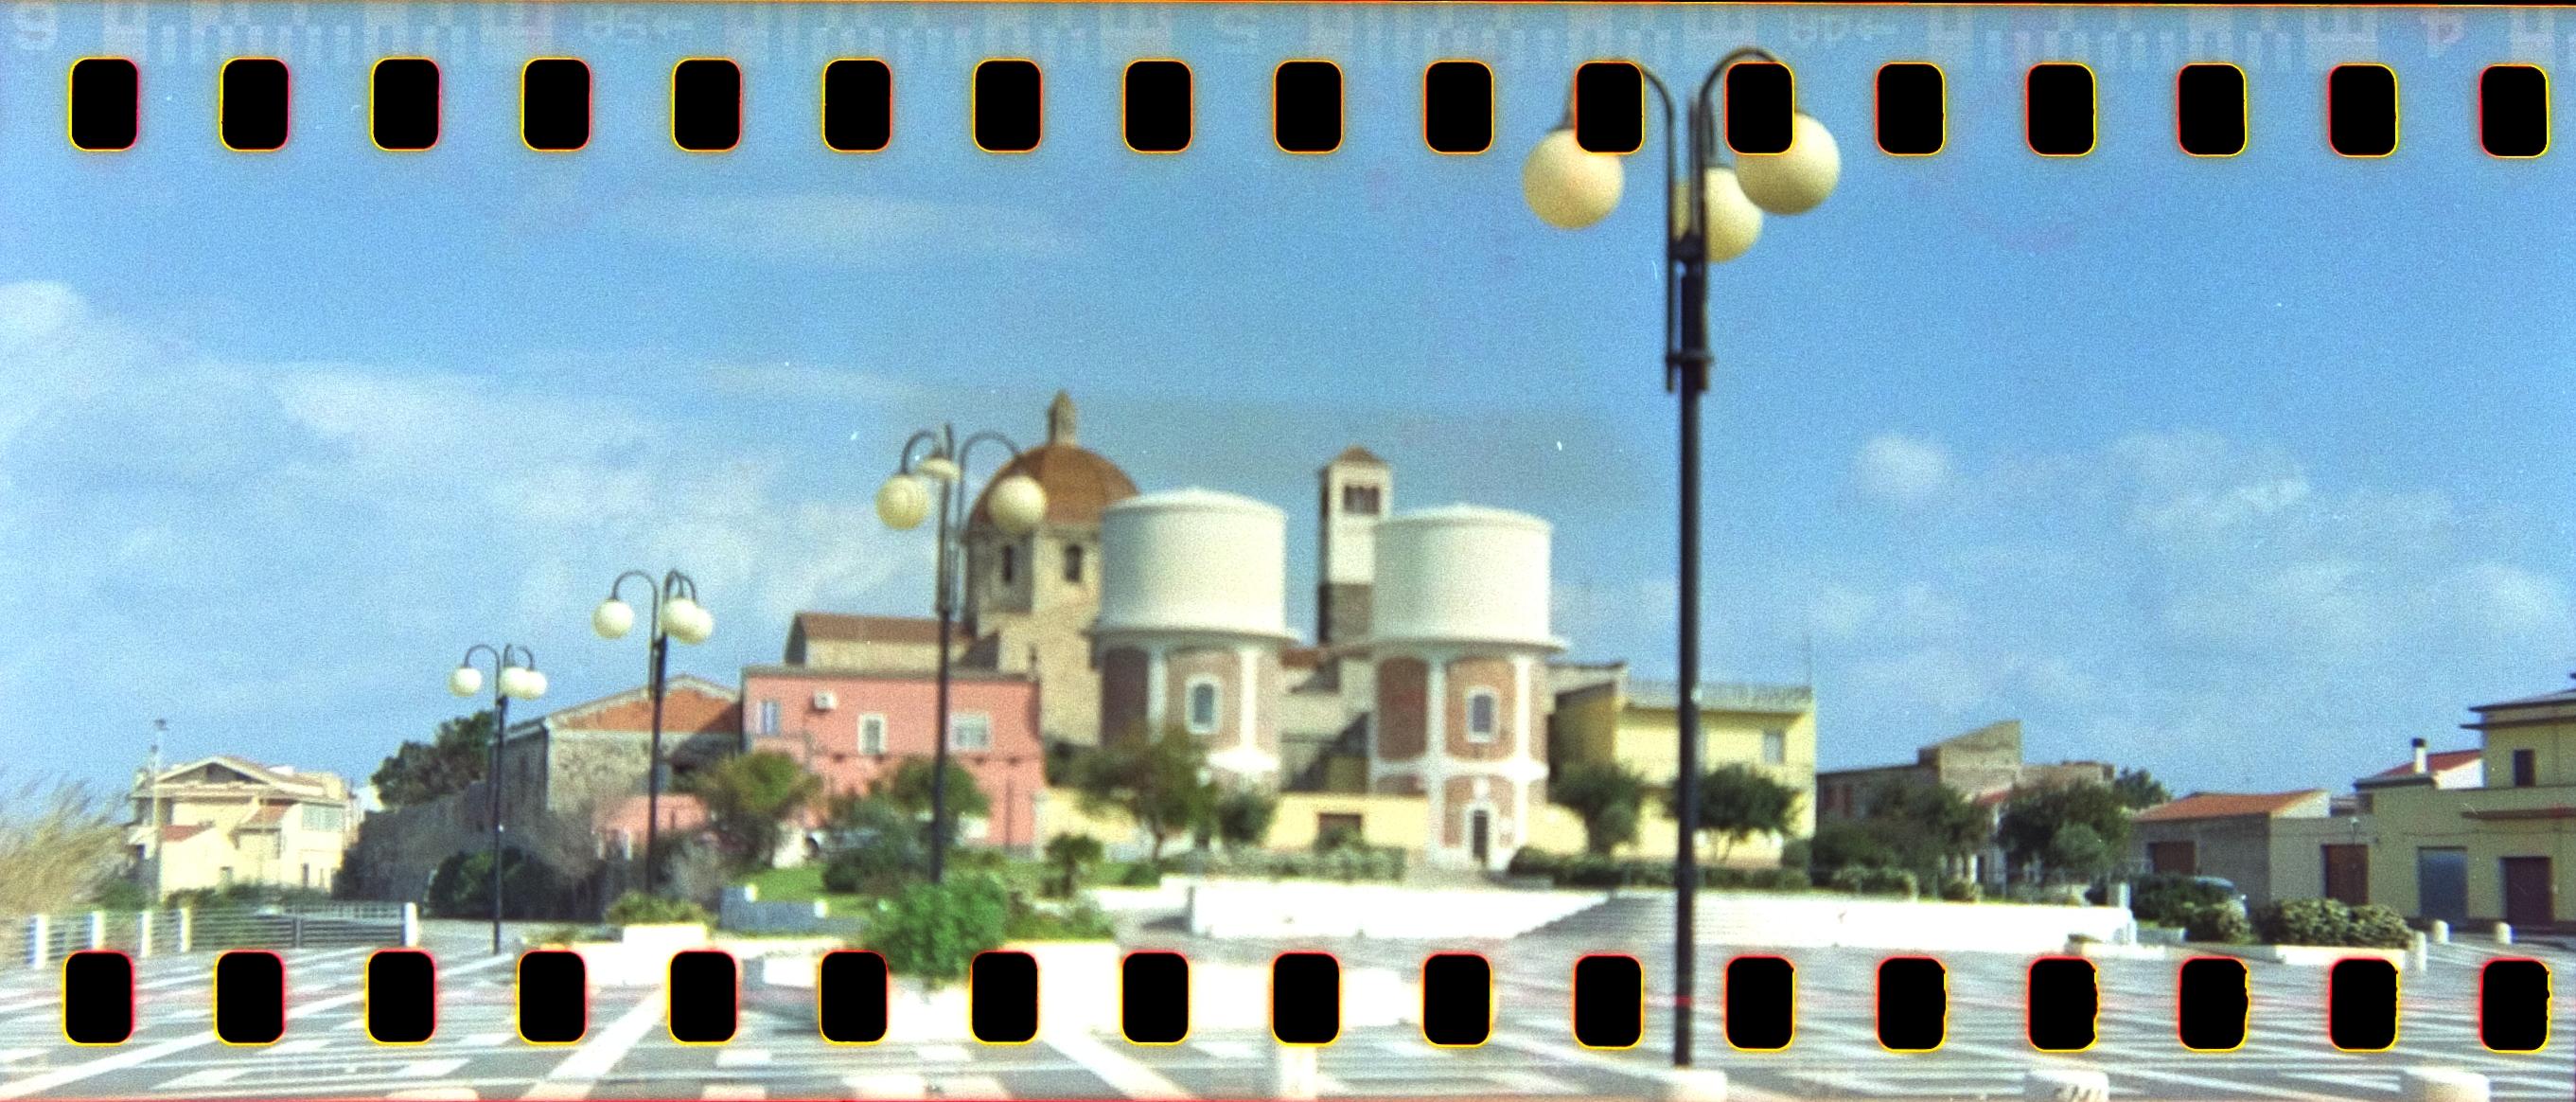 Cabras - Piazza Stagno